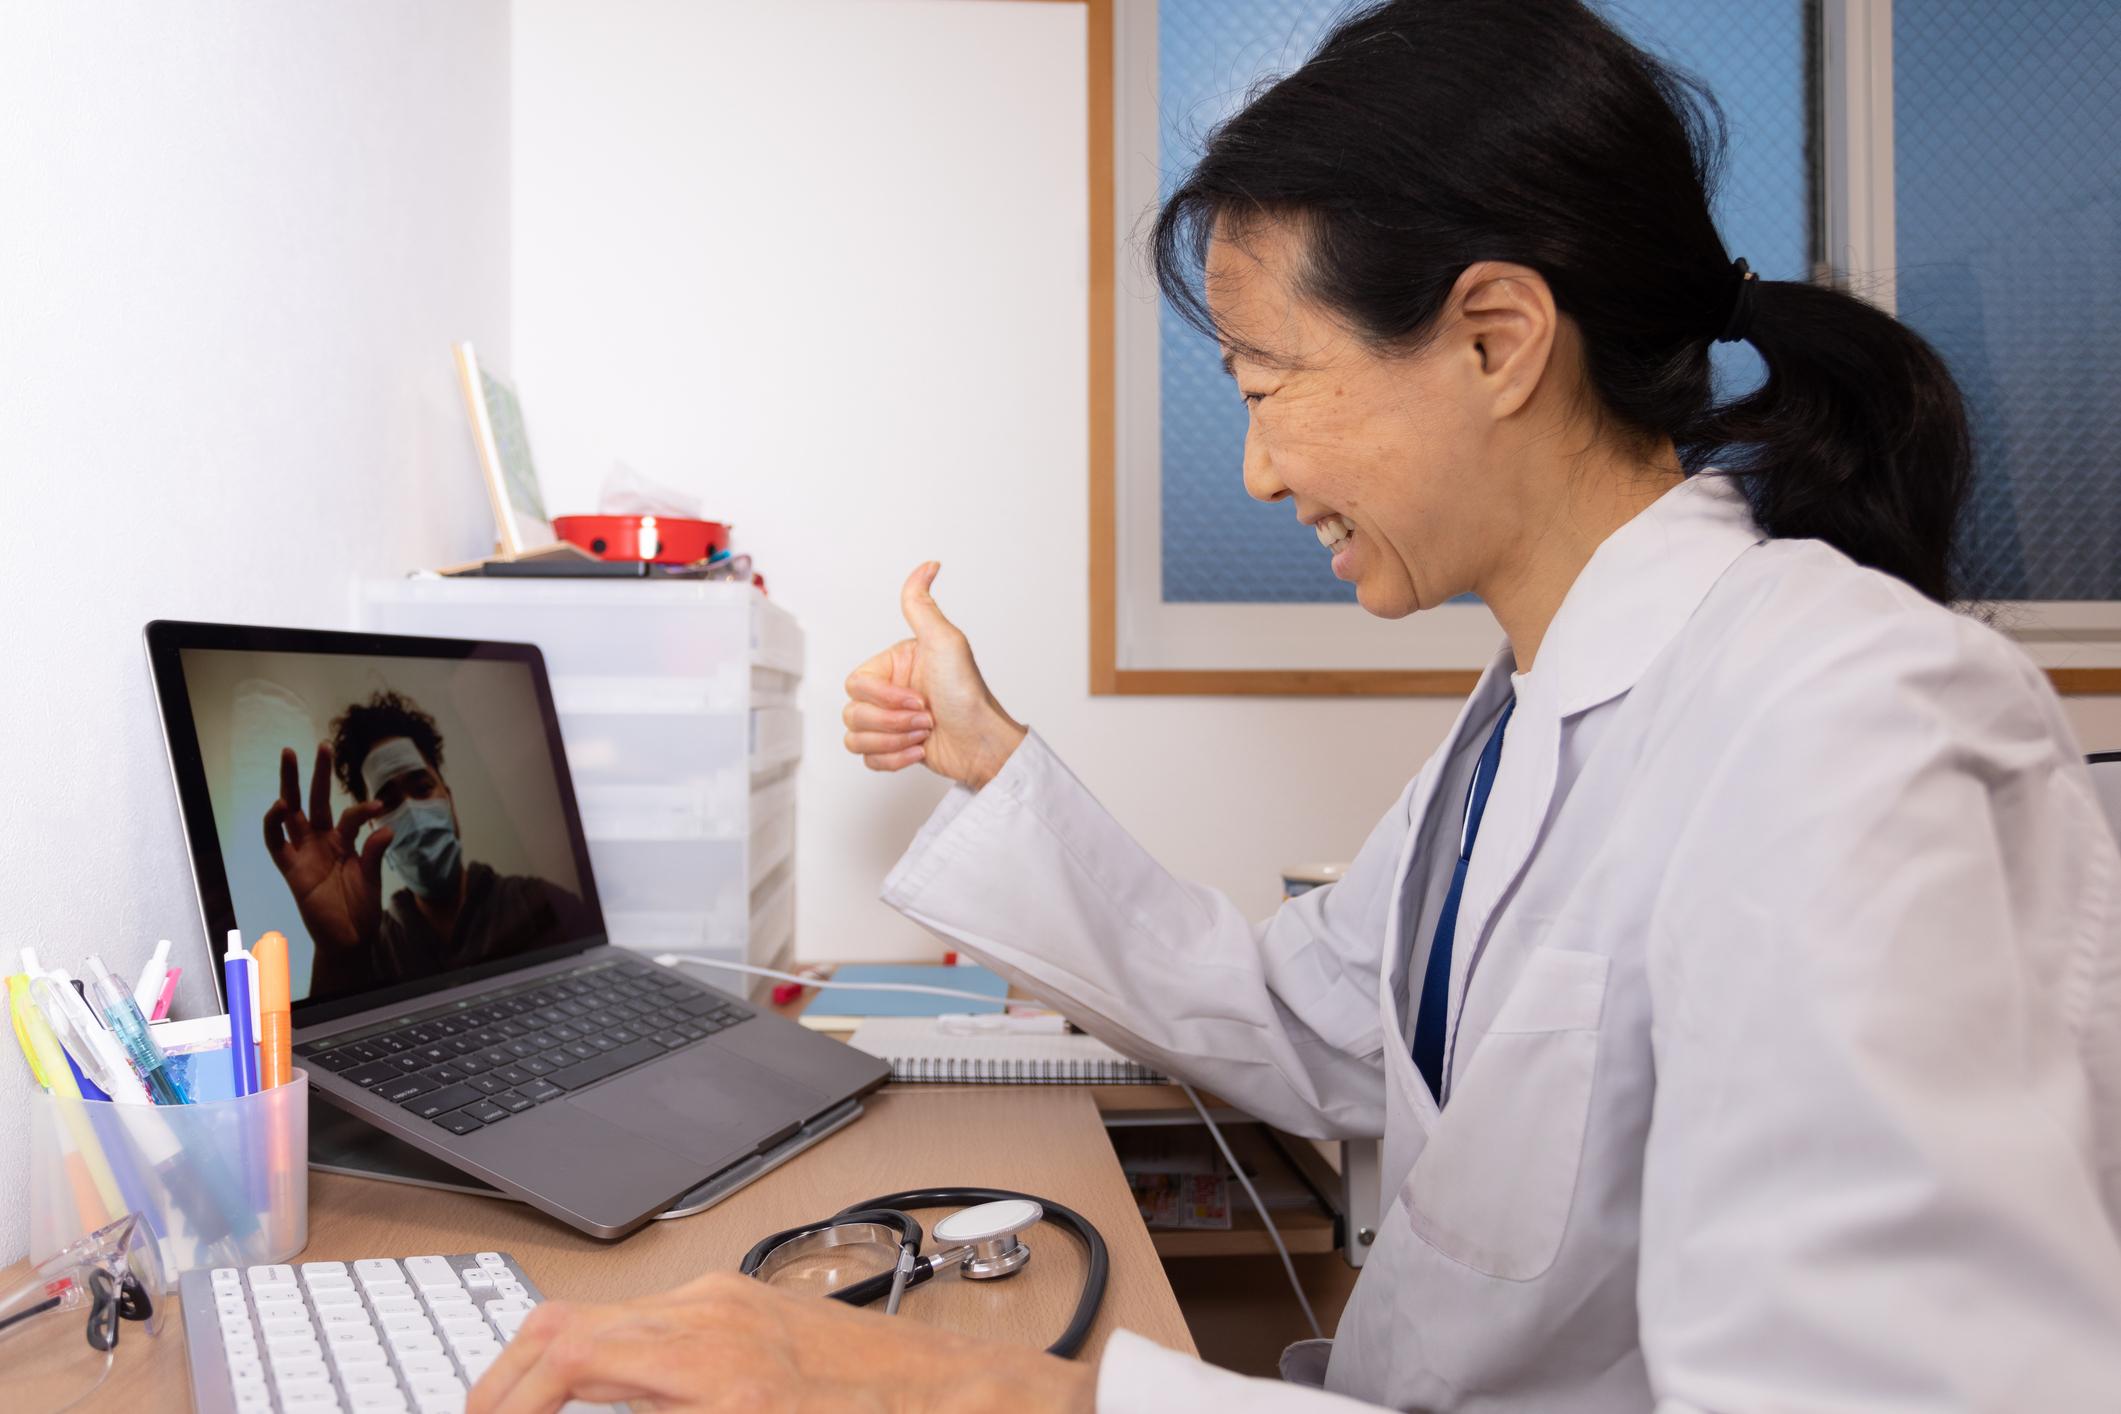 Doctor conducting telehealth visit